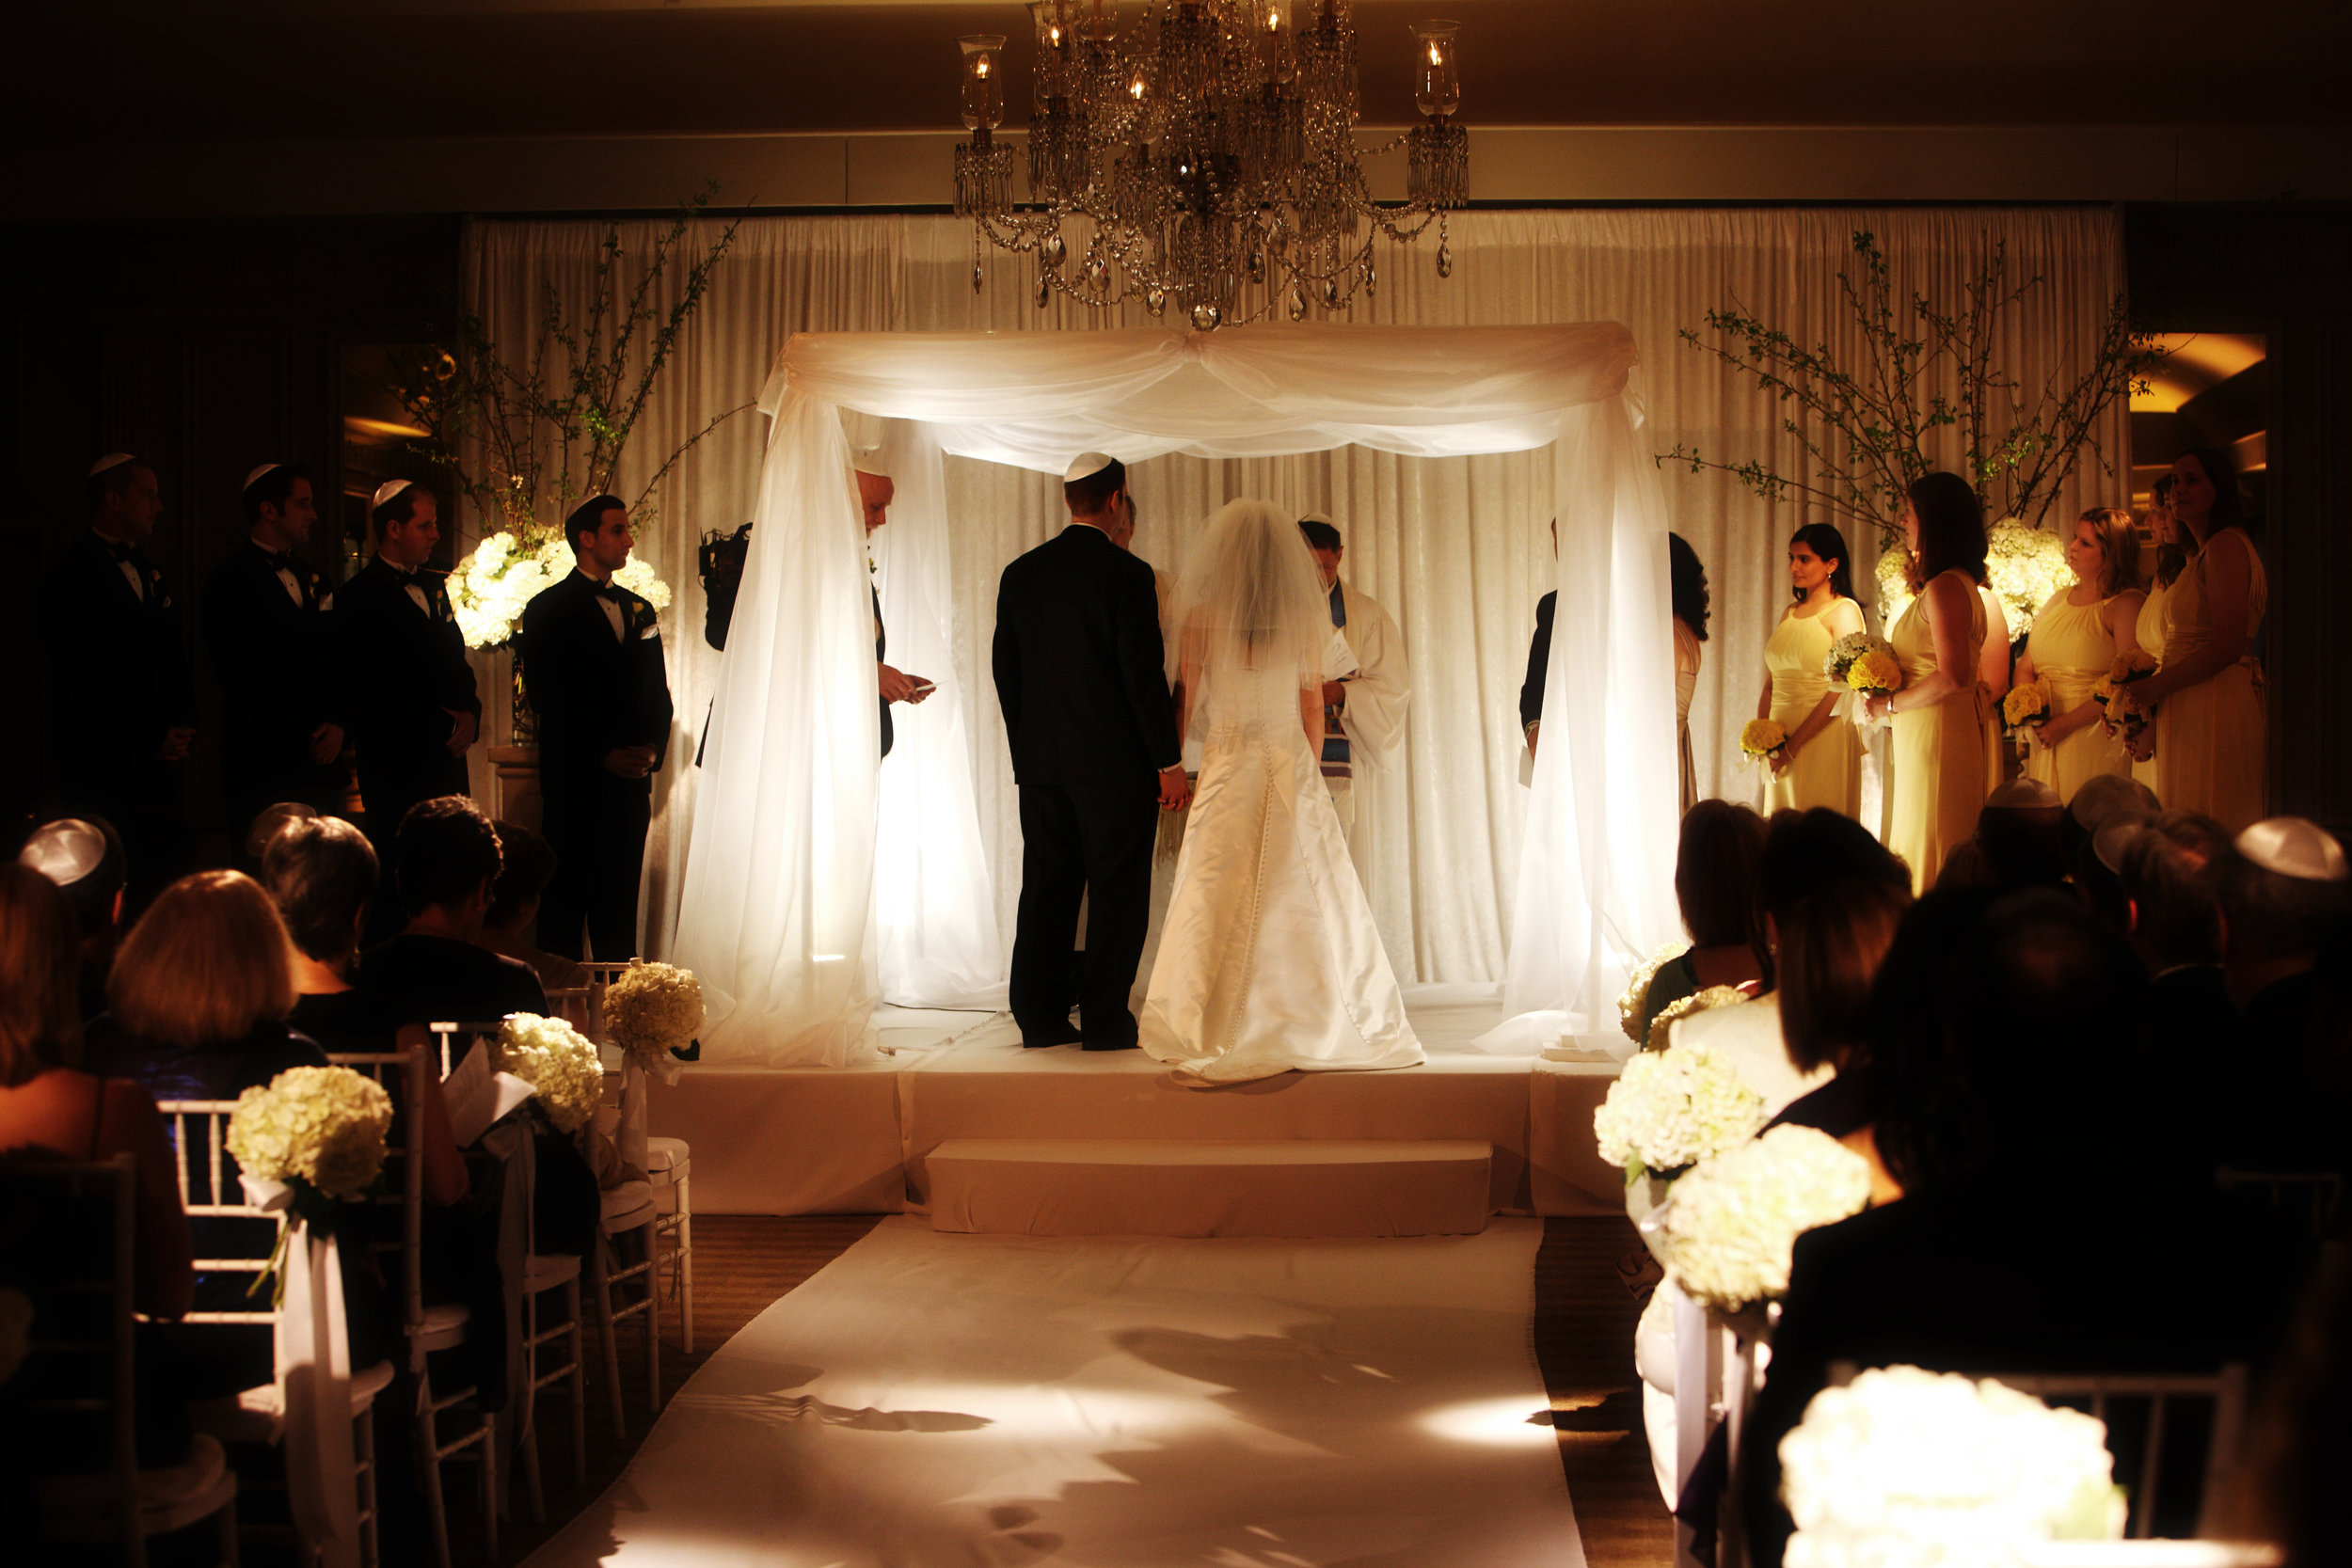 Weddings - 04 Ceremony 0002.JPG